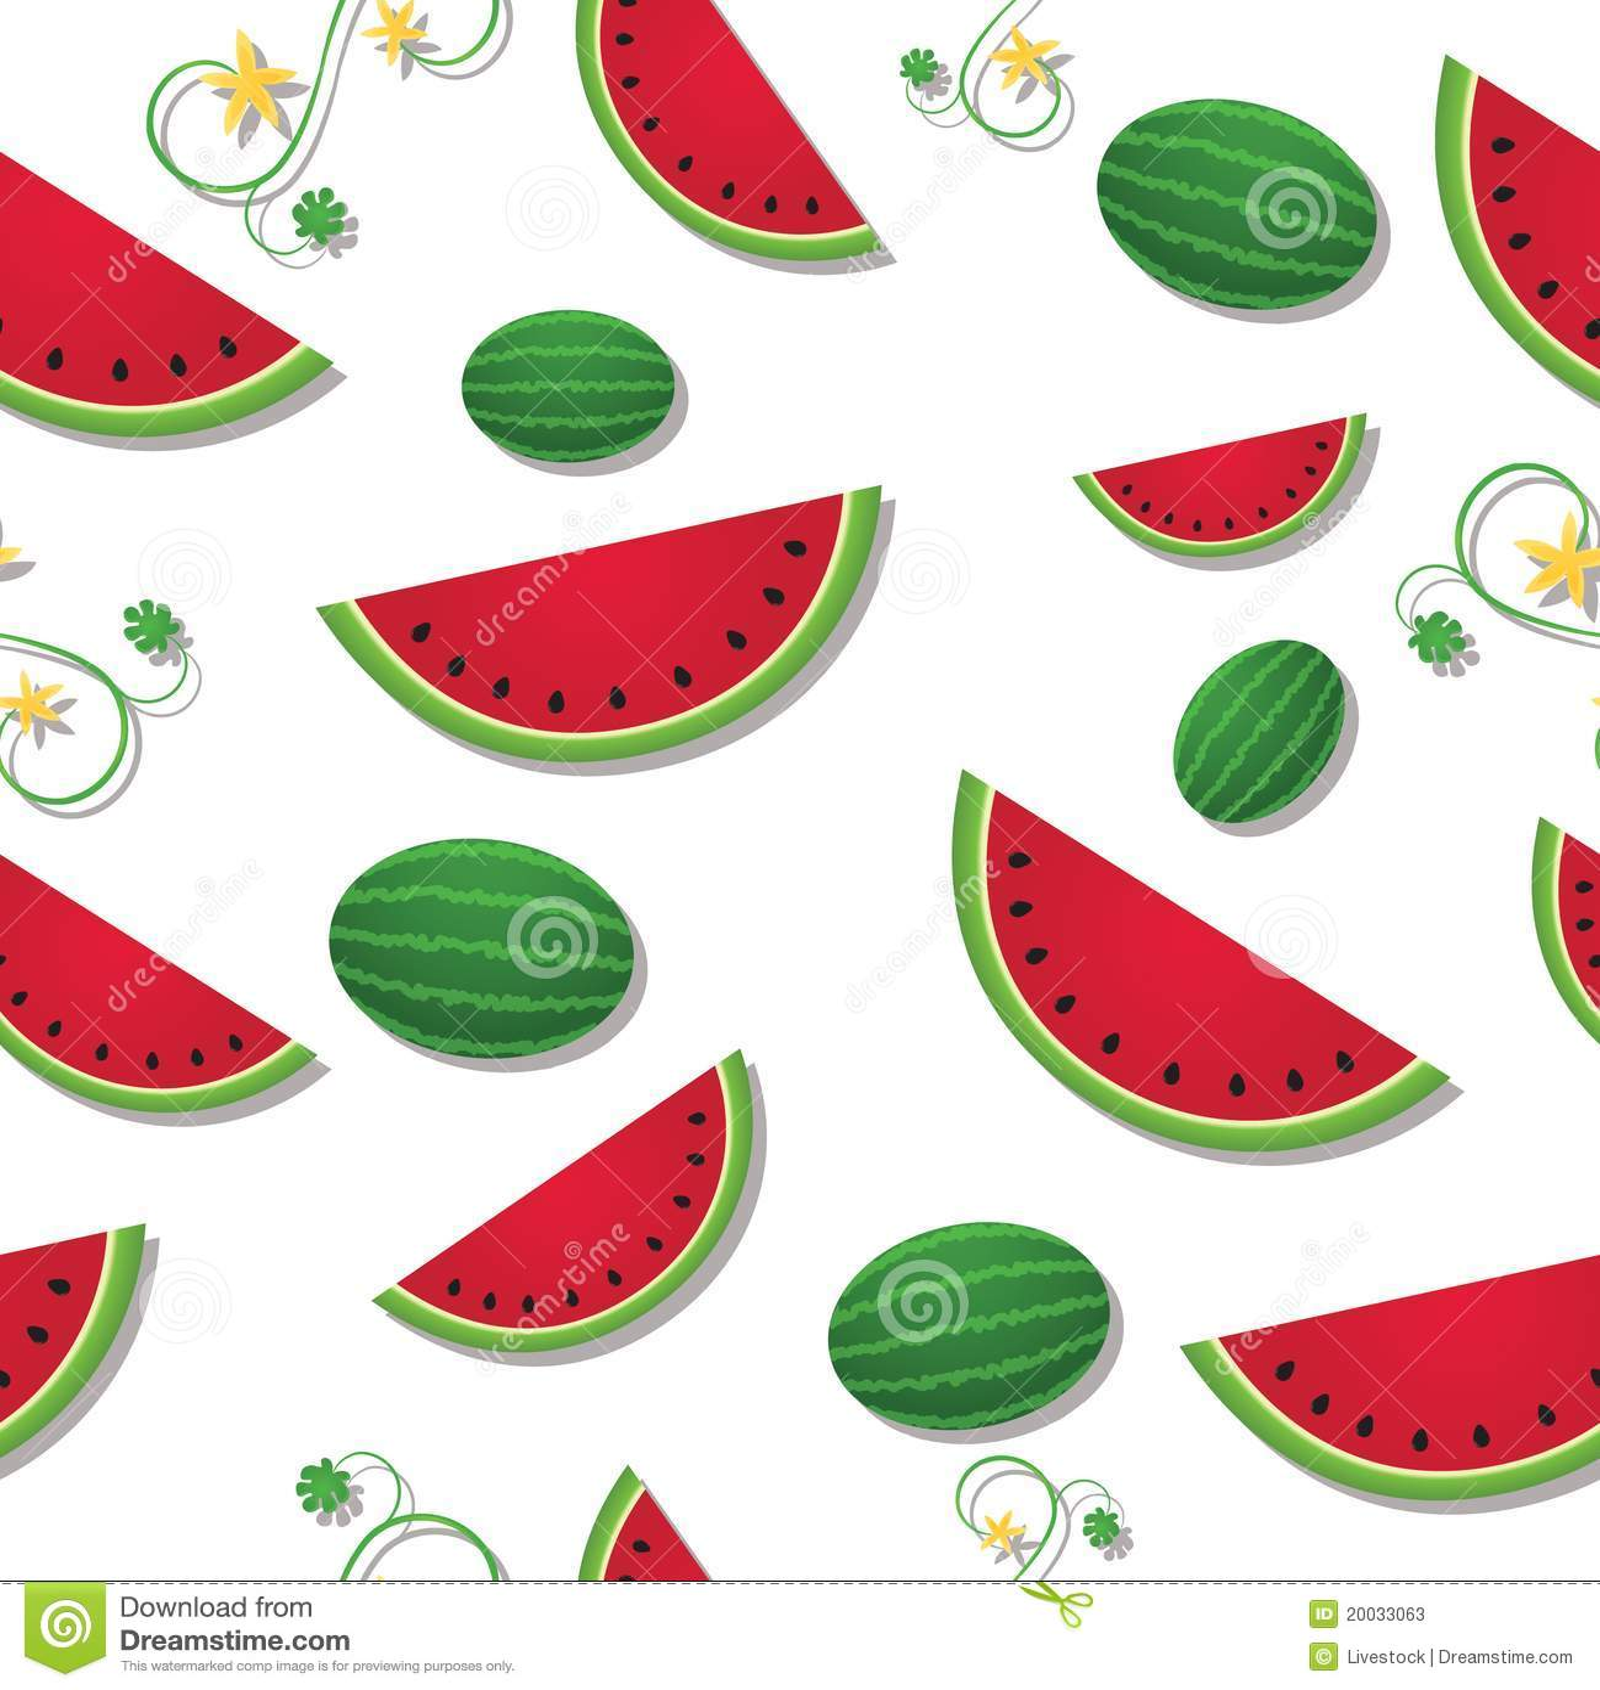 Watermelon Vine Clip Art Sliced watermelon with vines